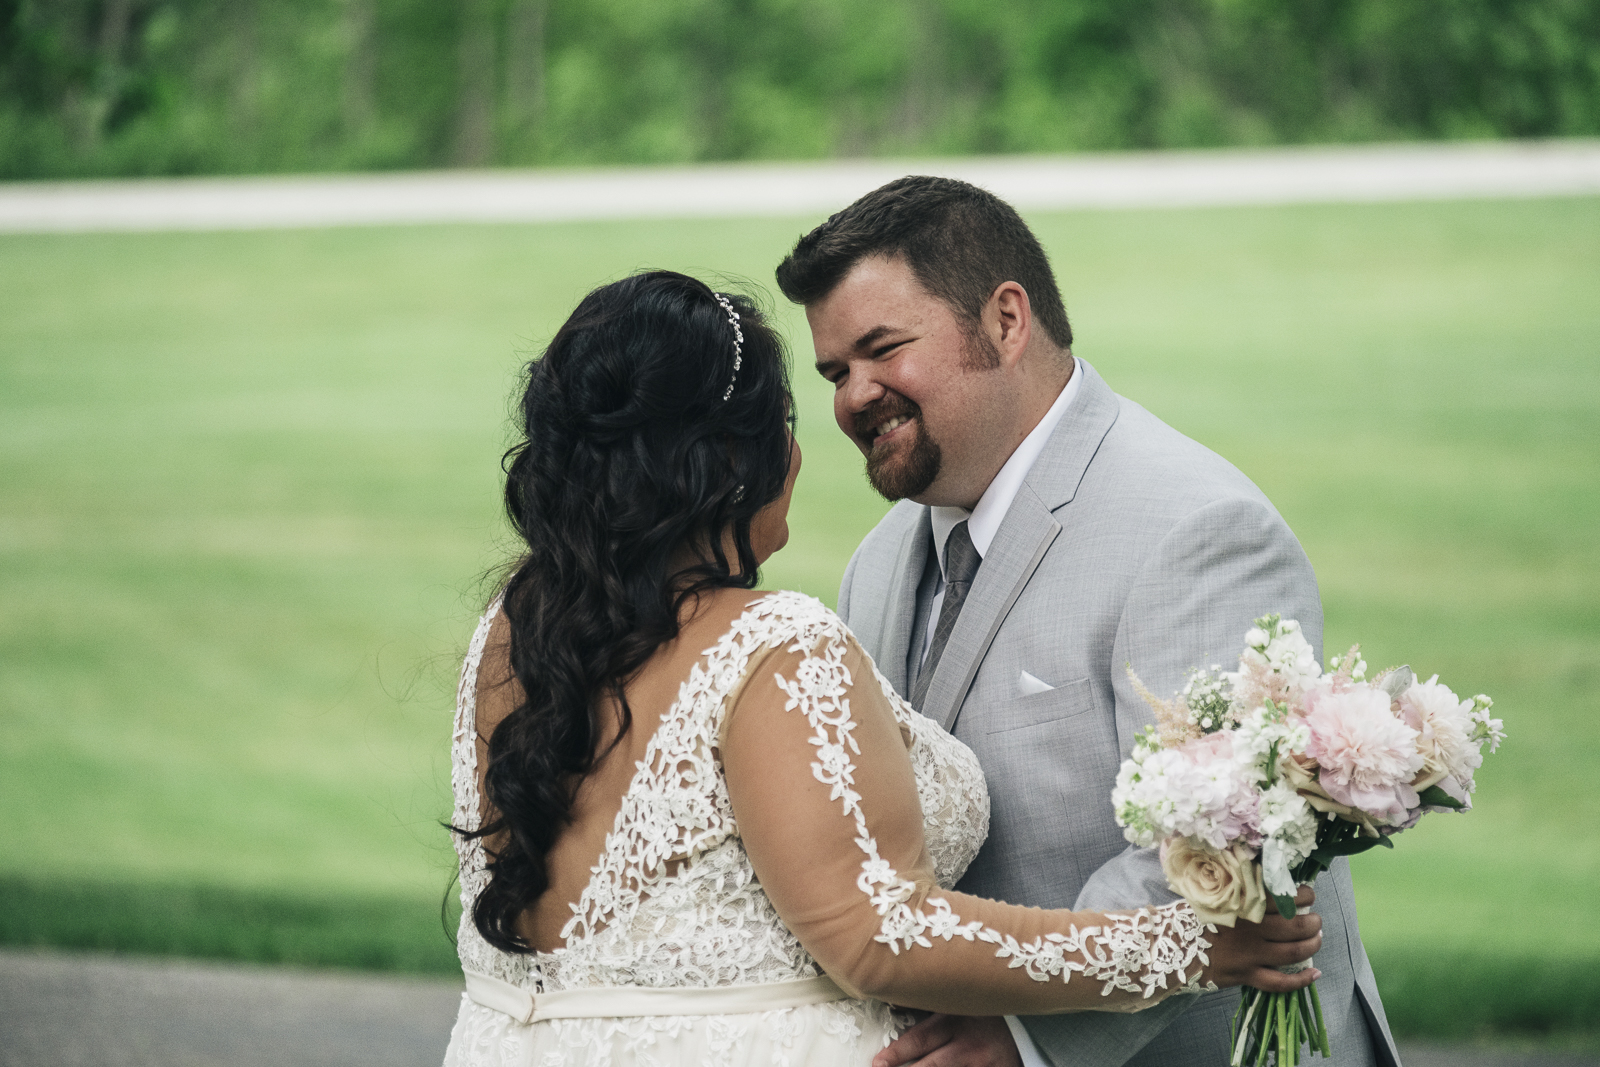 First look between bride and groom at Nazareth Hall wedding.